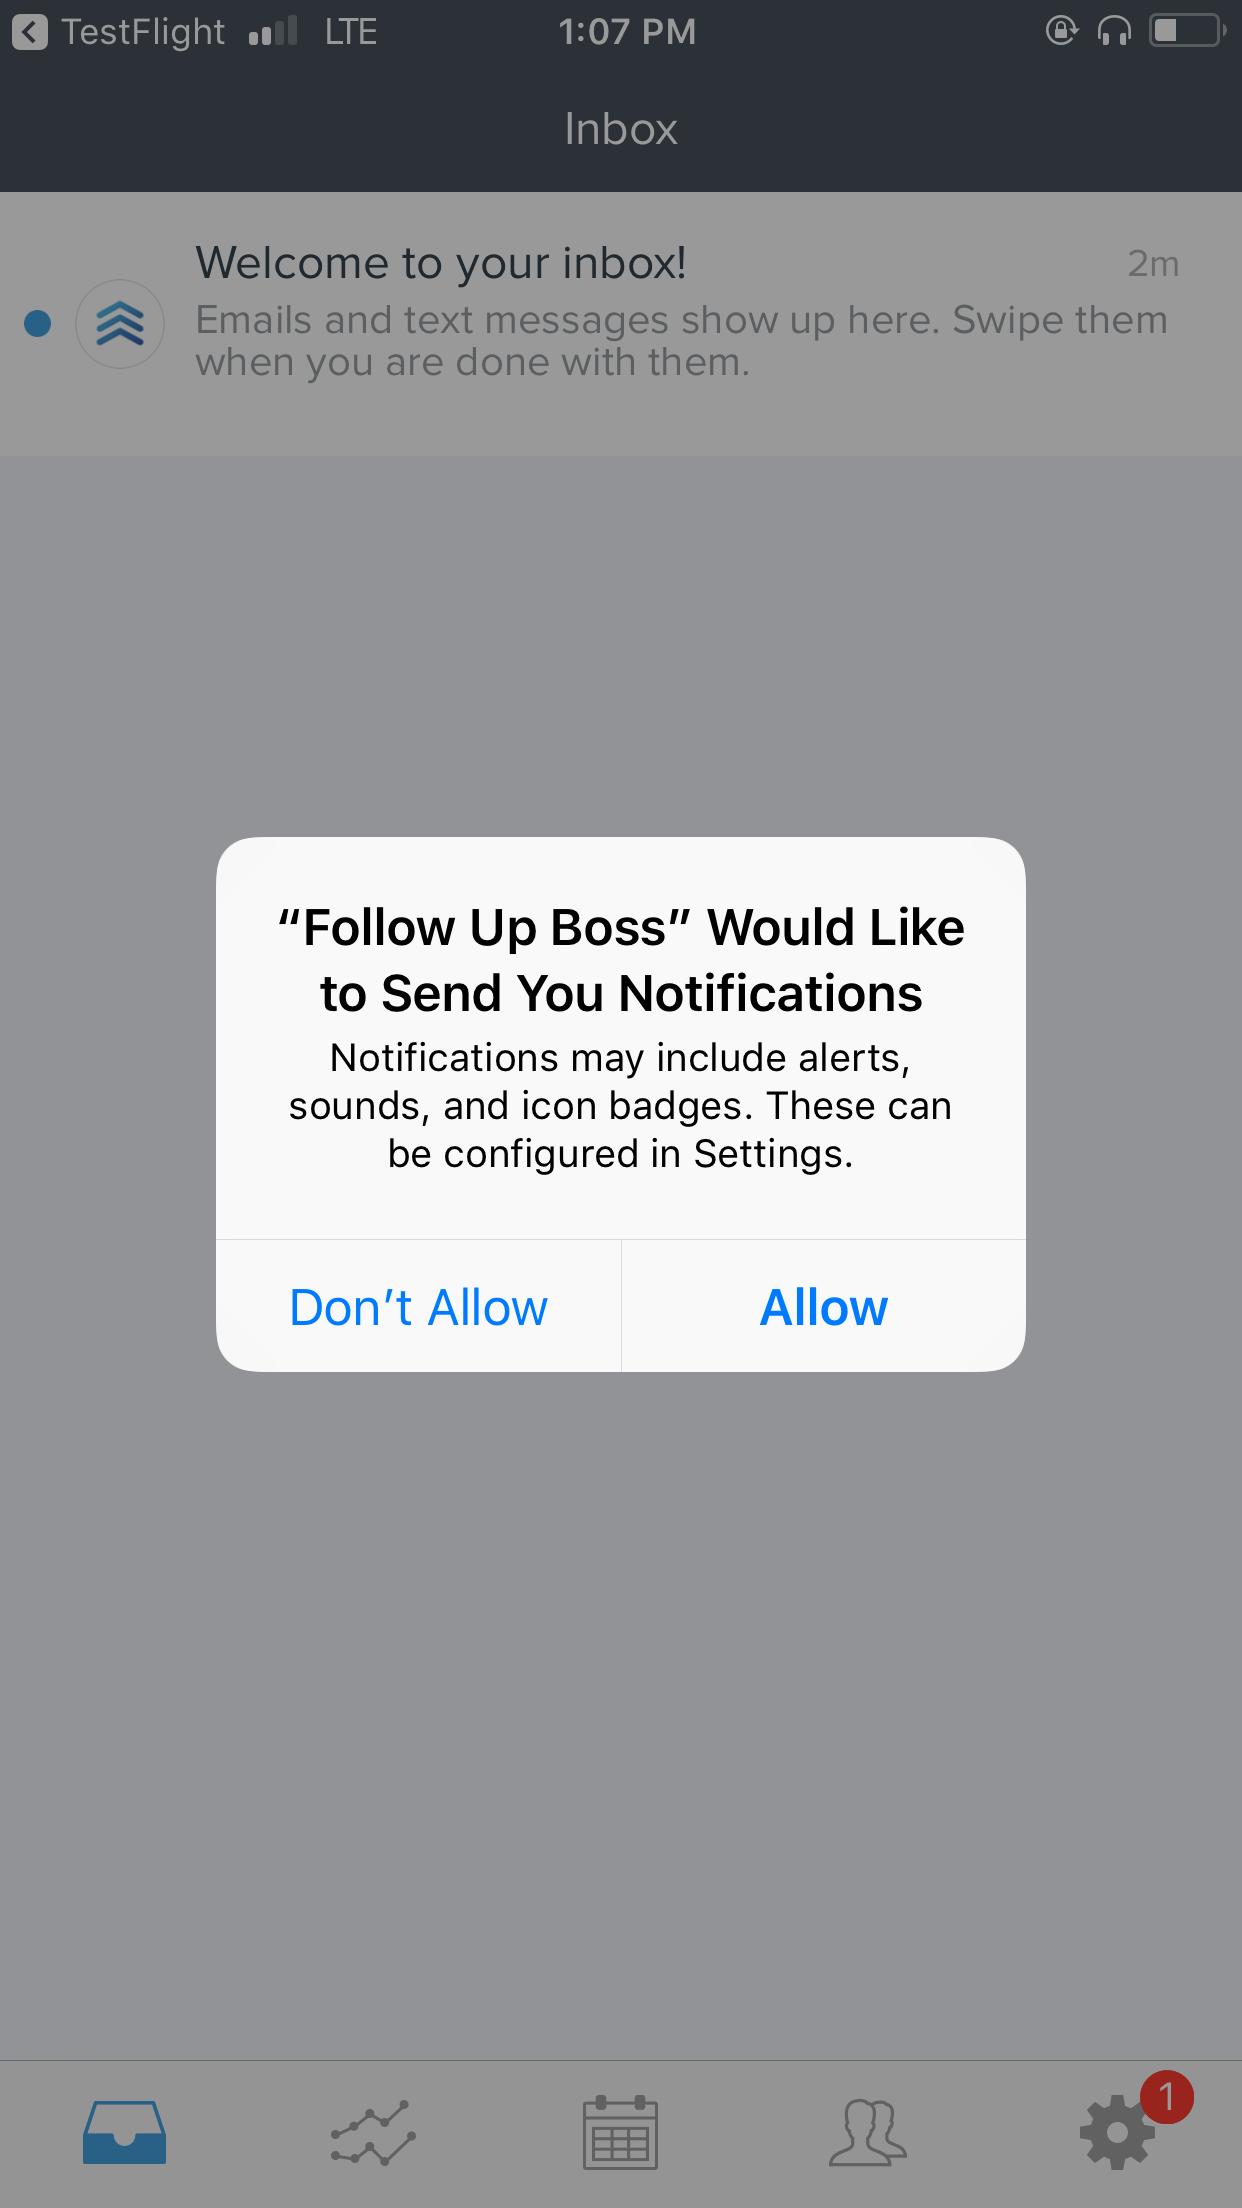 Push Notifications (Mobile) – Follow Up Boss